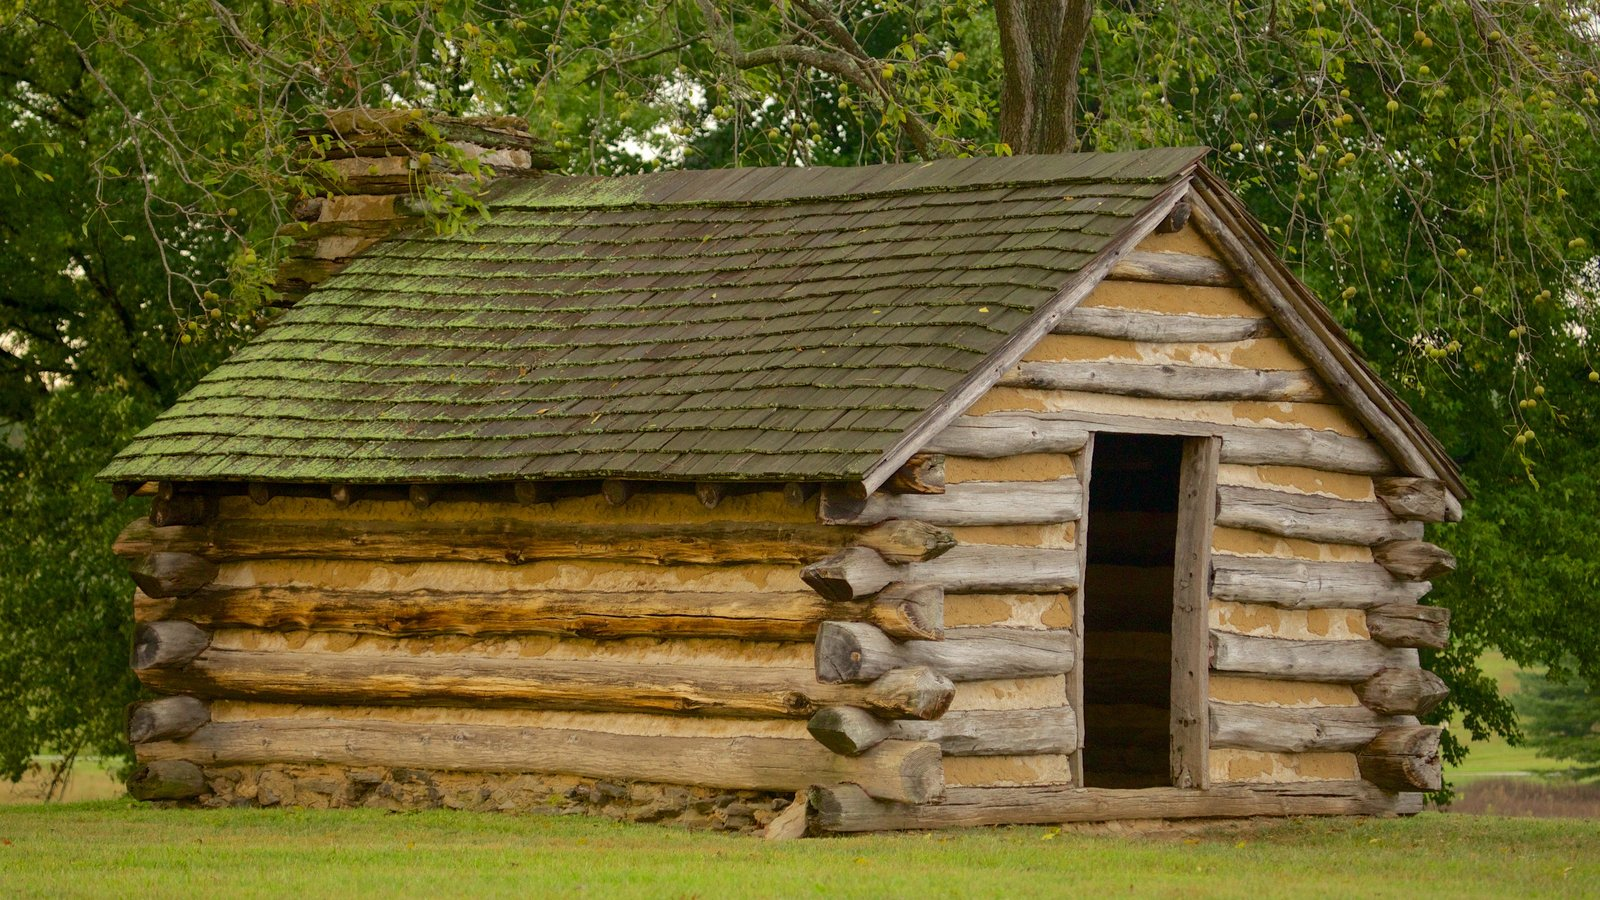 Valley Forge National Historic Park ofreciendo patrimonio de arquitectura